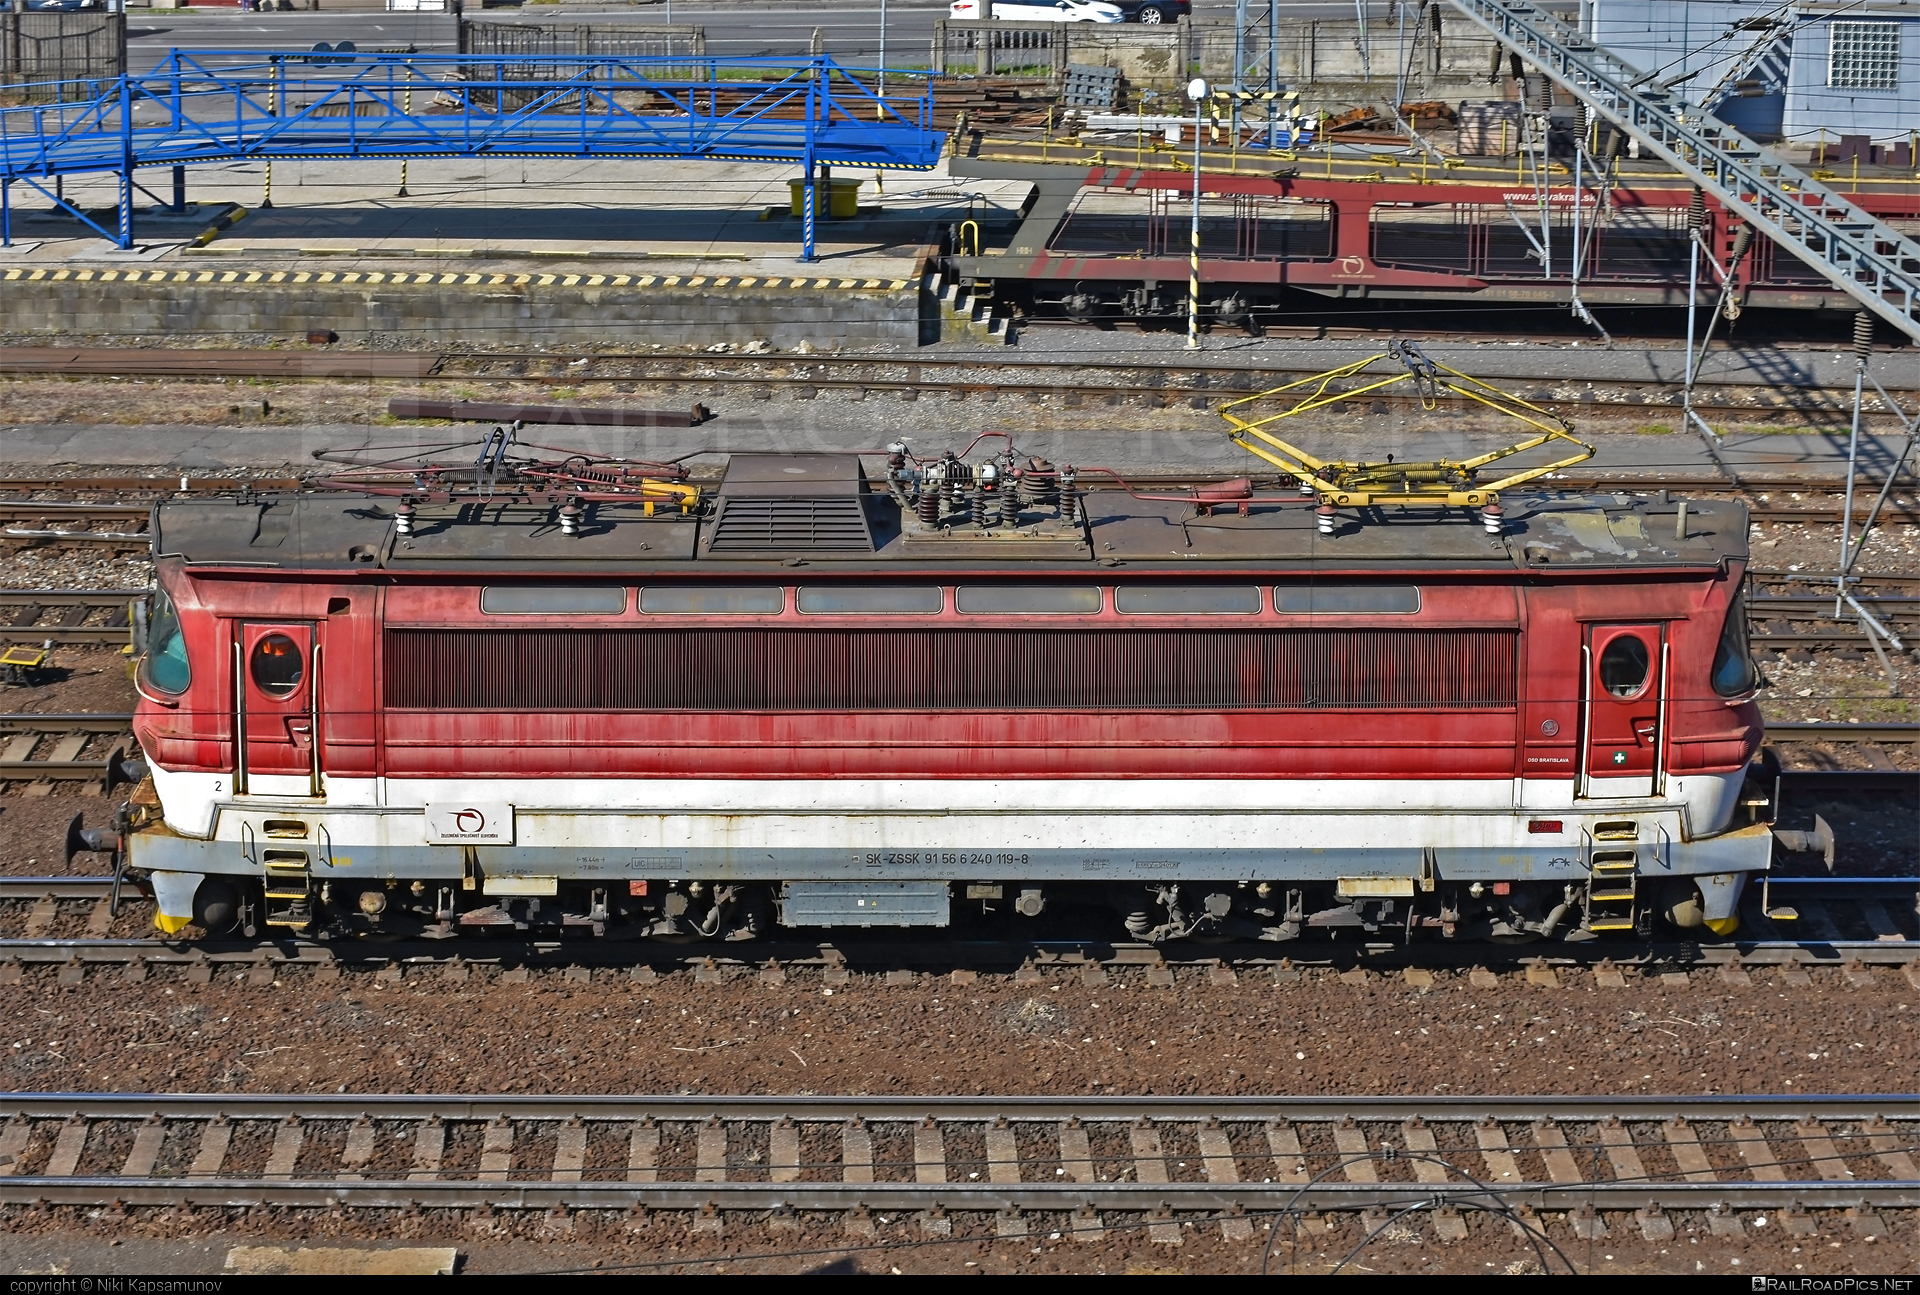 Škoda 47E - 240 119-8 operated by Železničná Spoločnost' Slovensko, a.s. #ZeleznicnaSpolocnostSlovensko #laminatka #locomotive240 #skoda #skoda47e #zssk